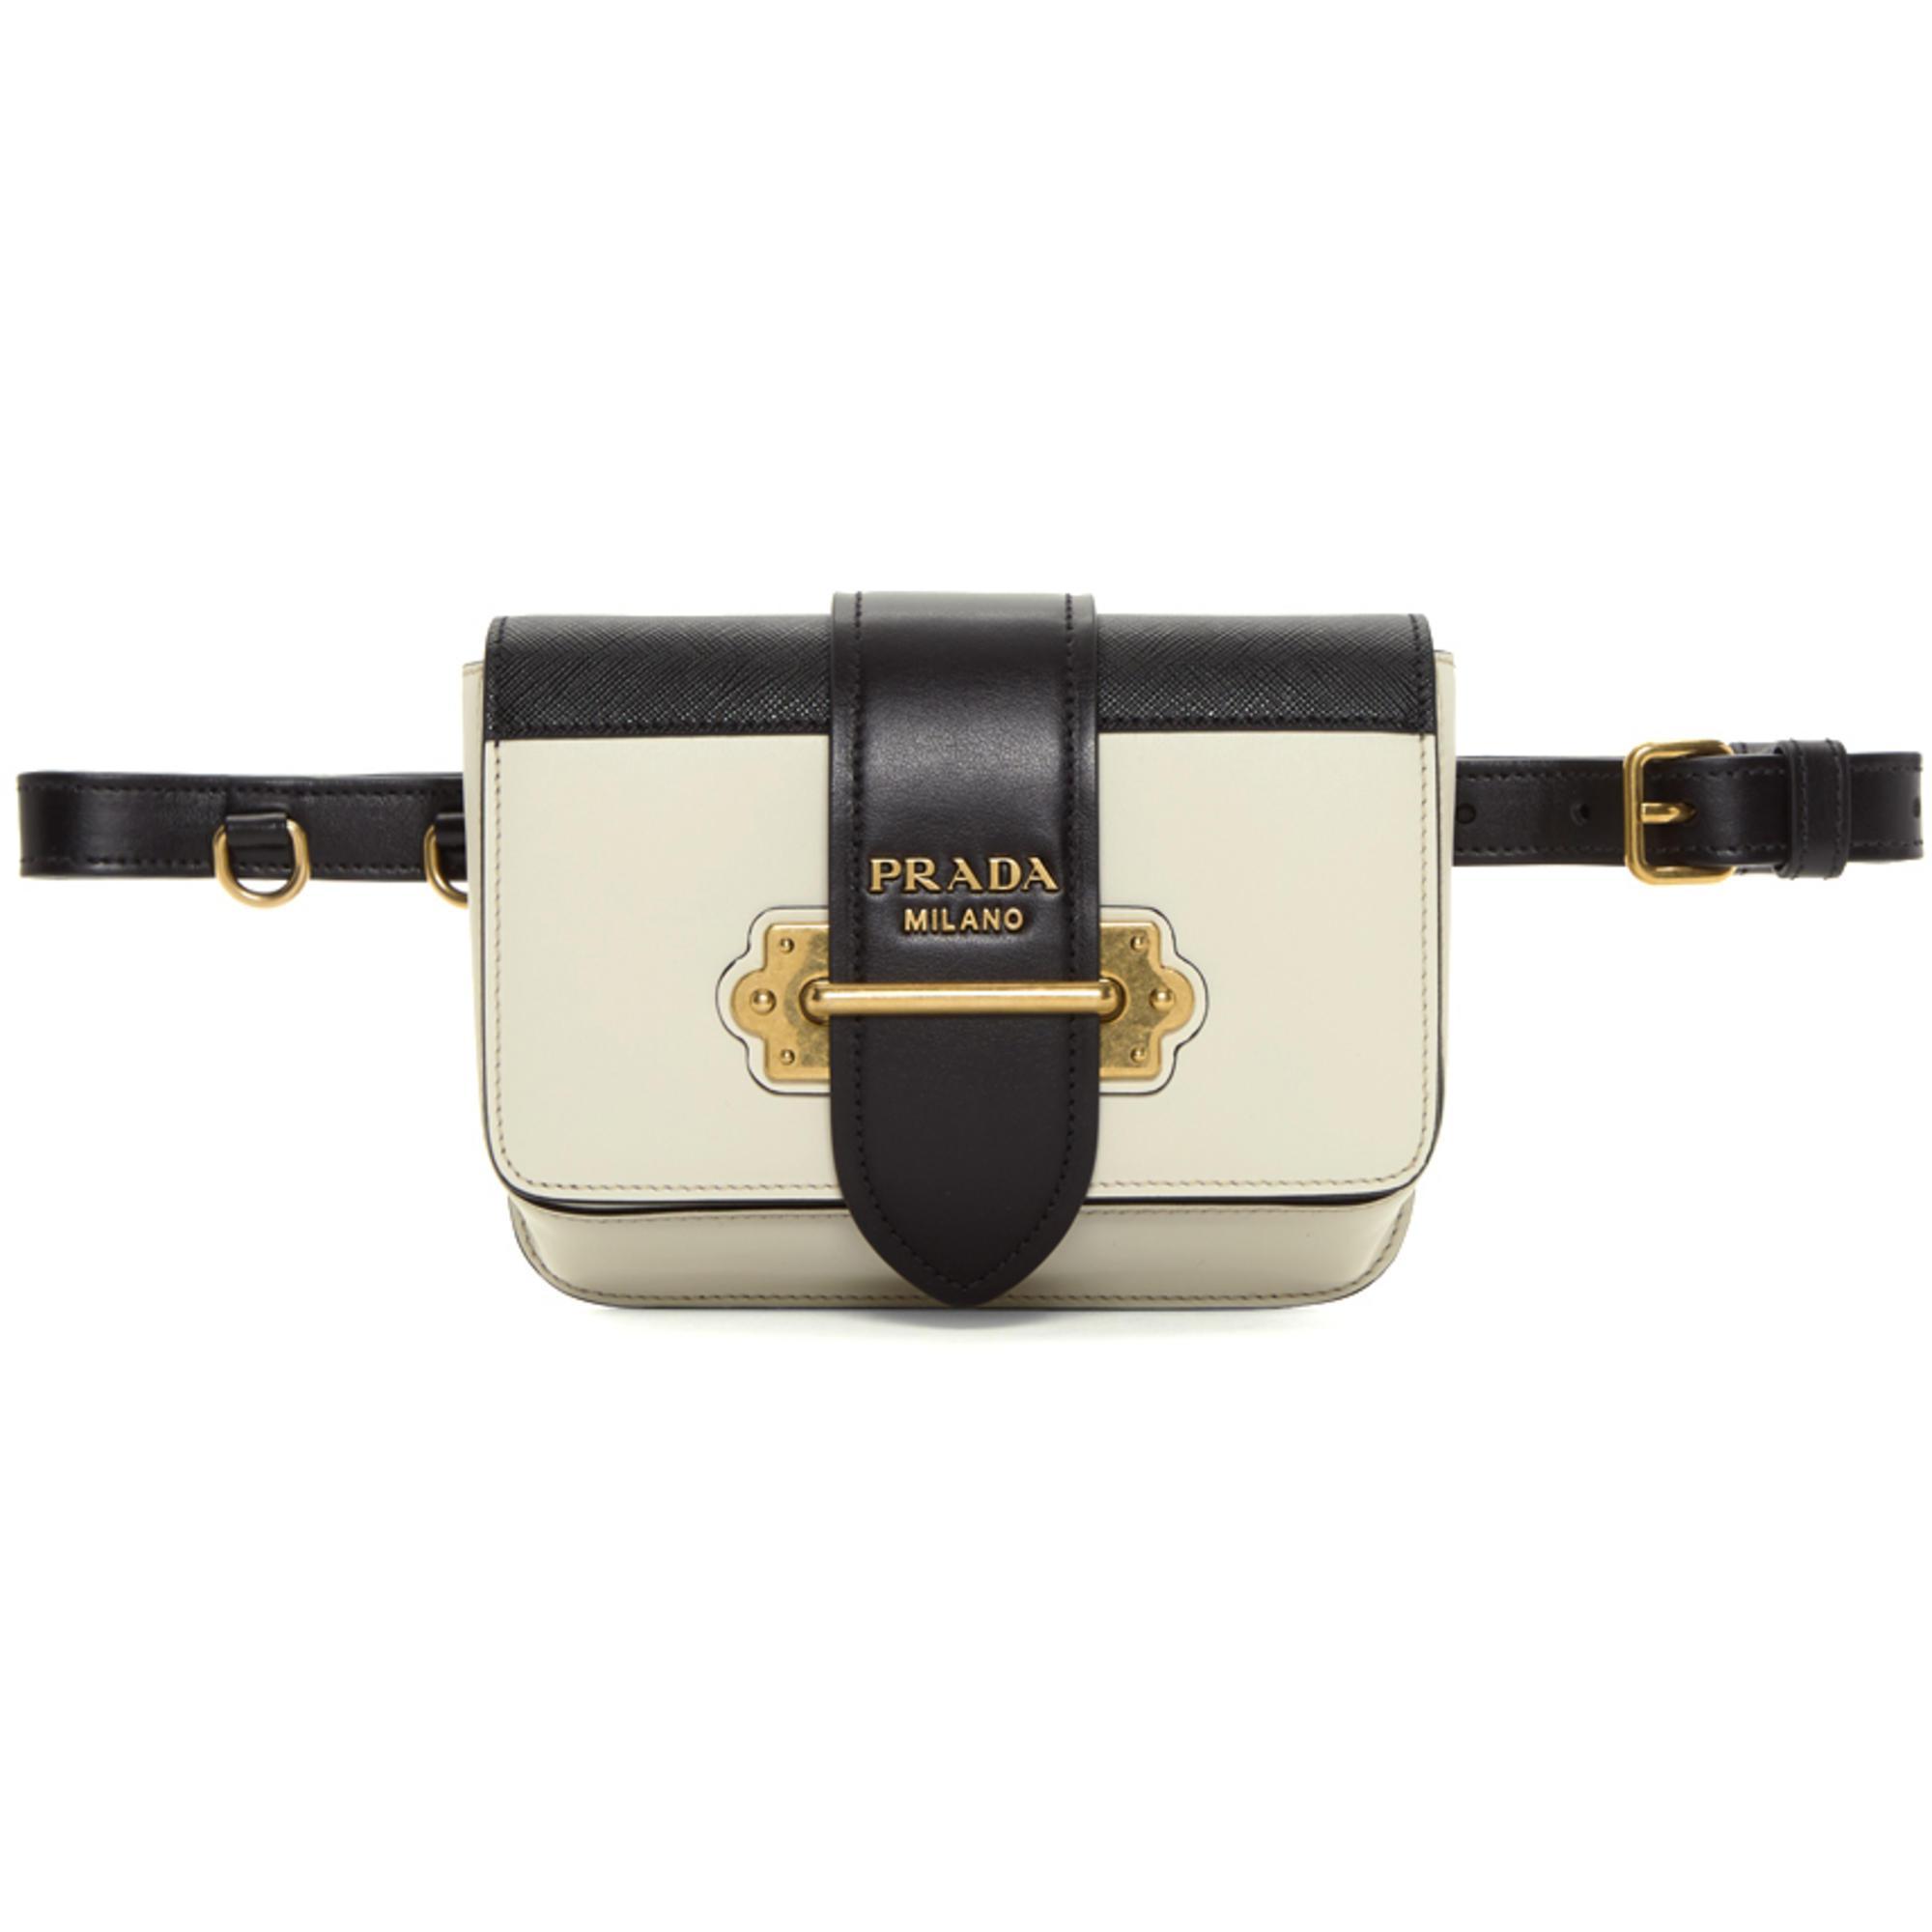 6ae95d878935 Prada Off-white And Black Belt Bag in White - Lyst